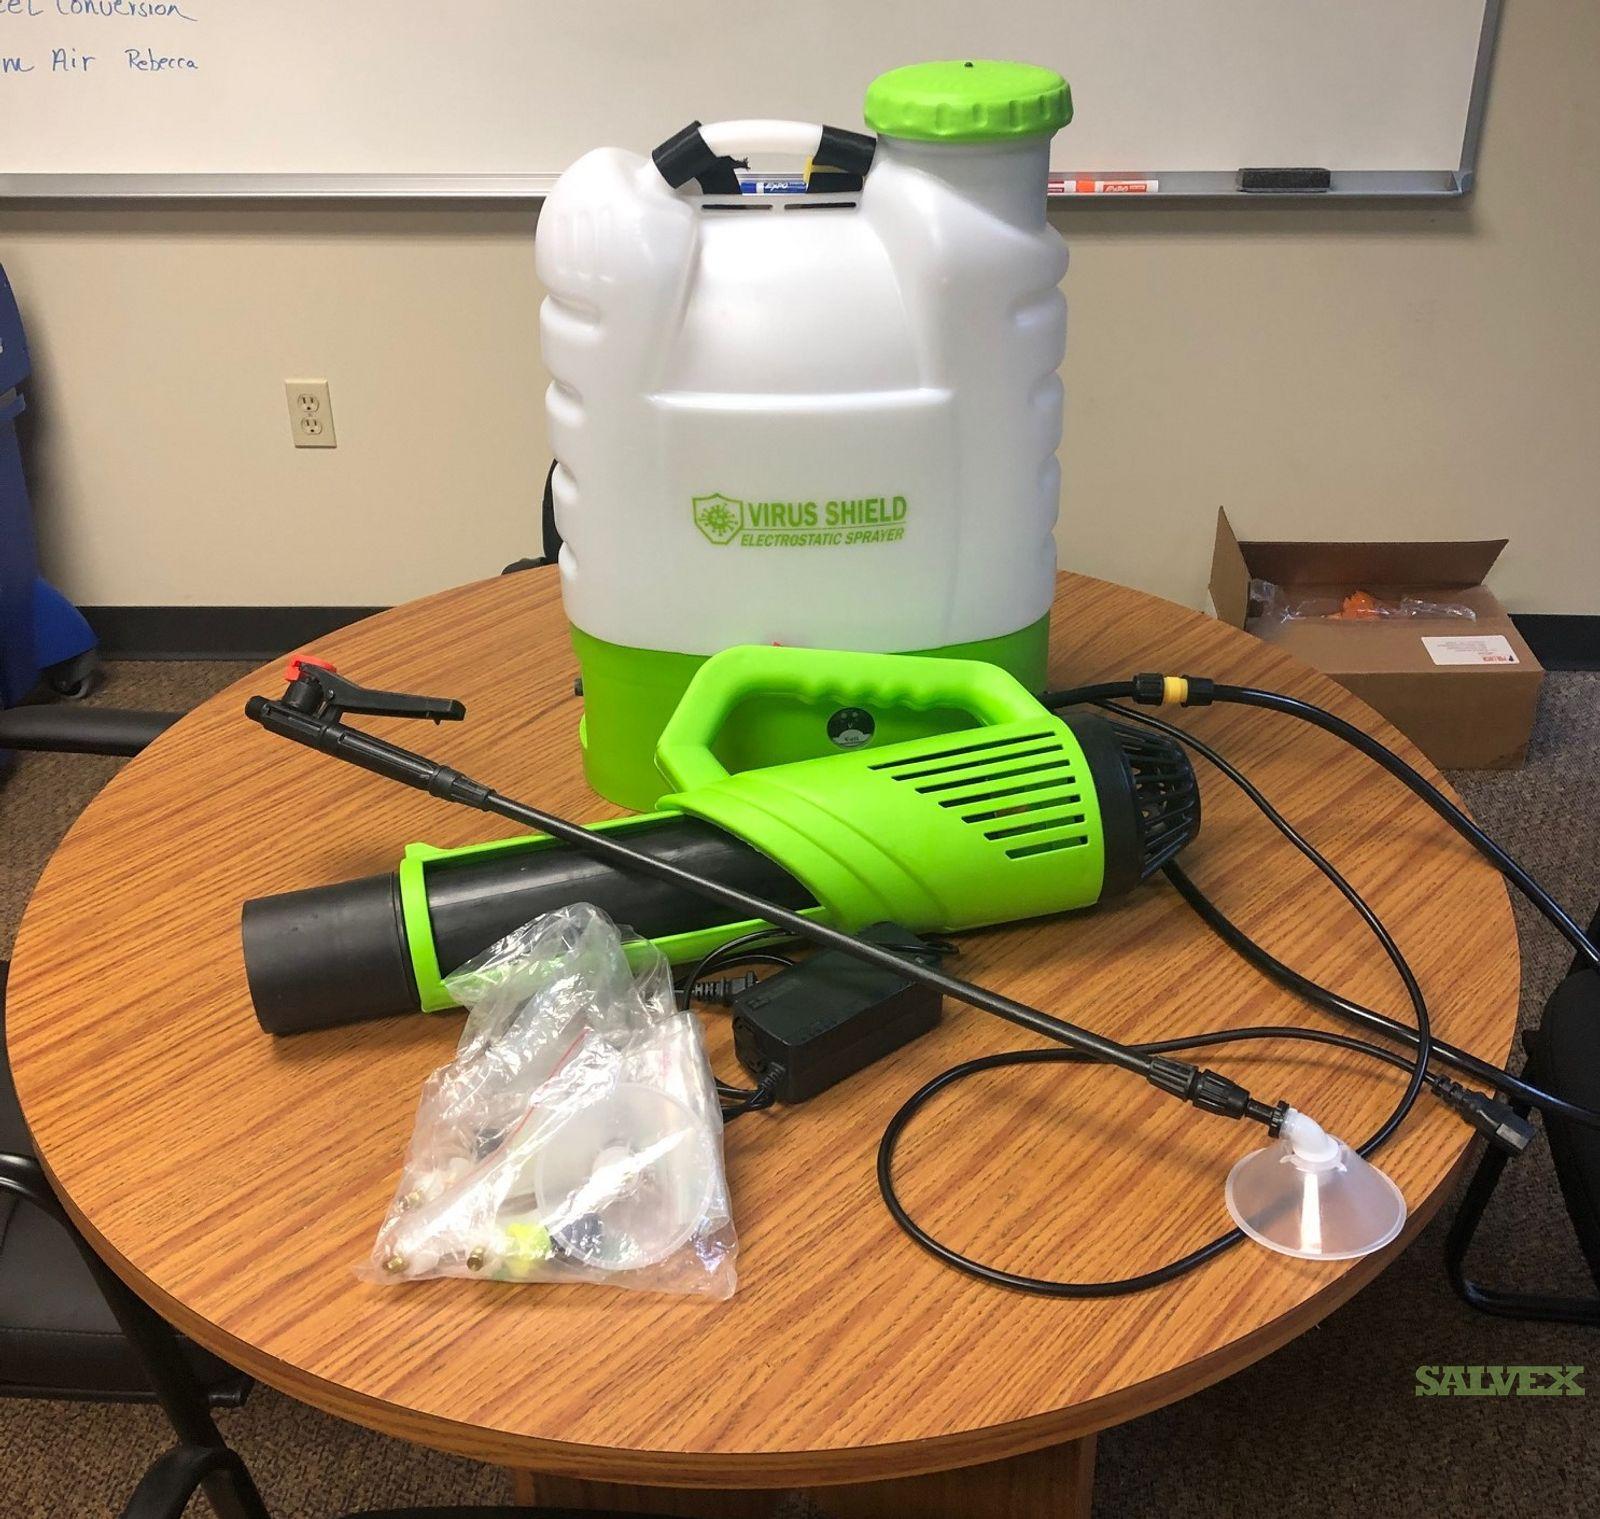 Electrostatic Sprayers  Uf-0016l-2 Air-fed  Multi-functional /16l Cordless Backpack Electrostatic Mist Sprayer  Portable Handle Fogger Machine Sprayer Ulv Fogger For Disinfection(Estimated 400 Units)